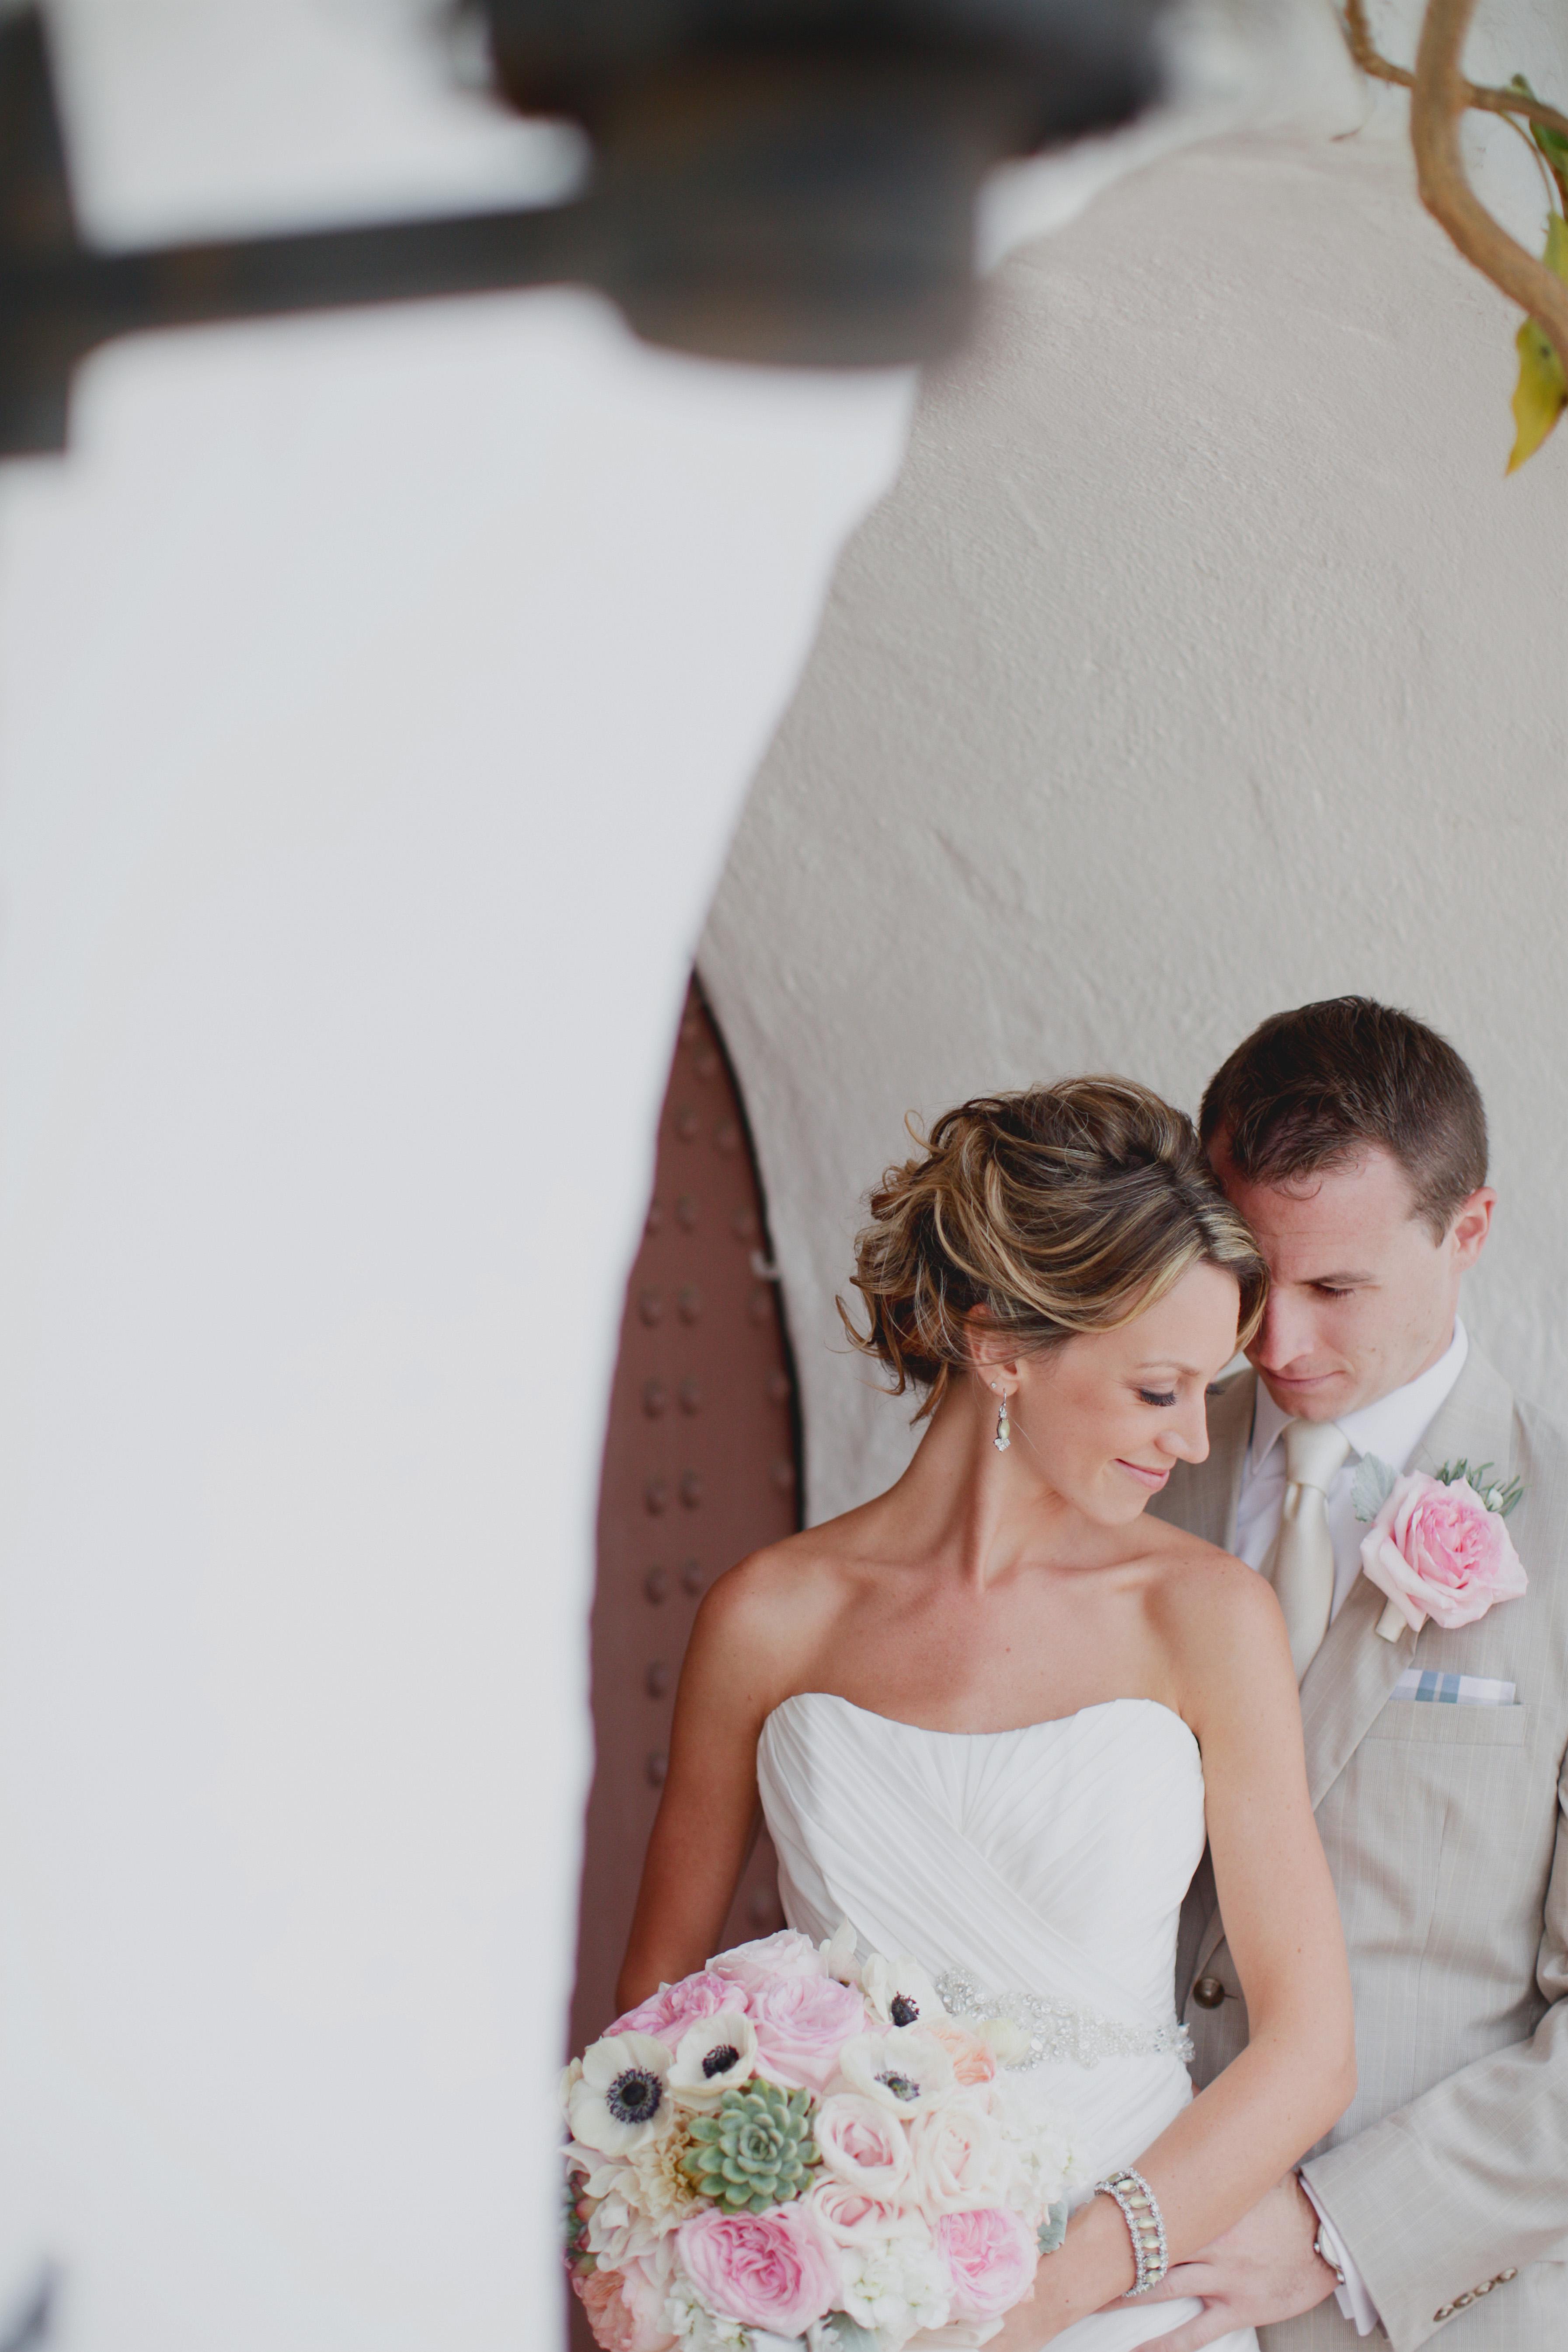 Casa Romantica wedding, San Clemente Wedding, Brandon Kidd Photography, fresh herb wedding decor